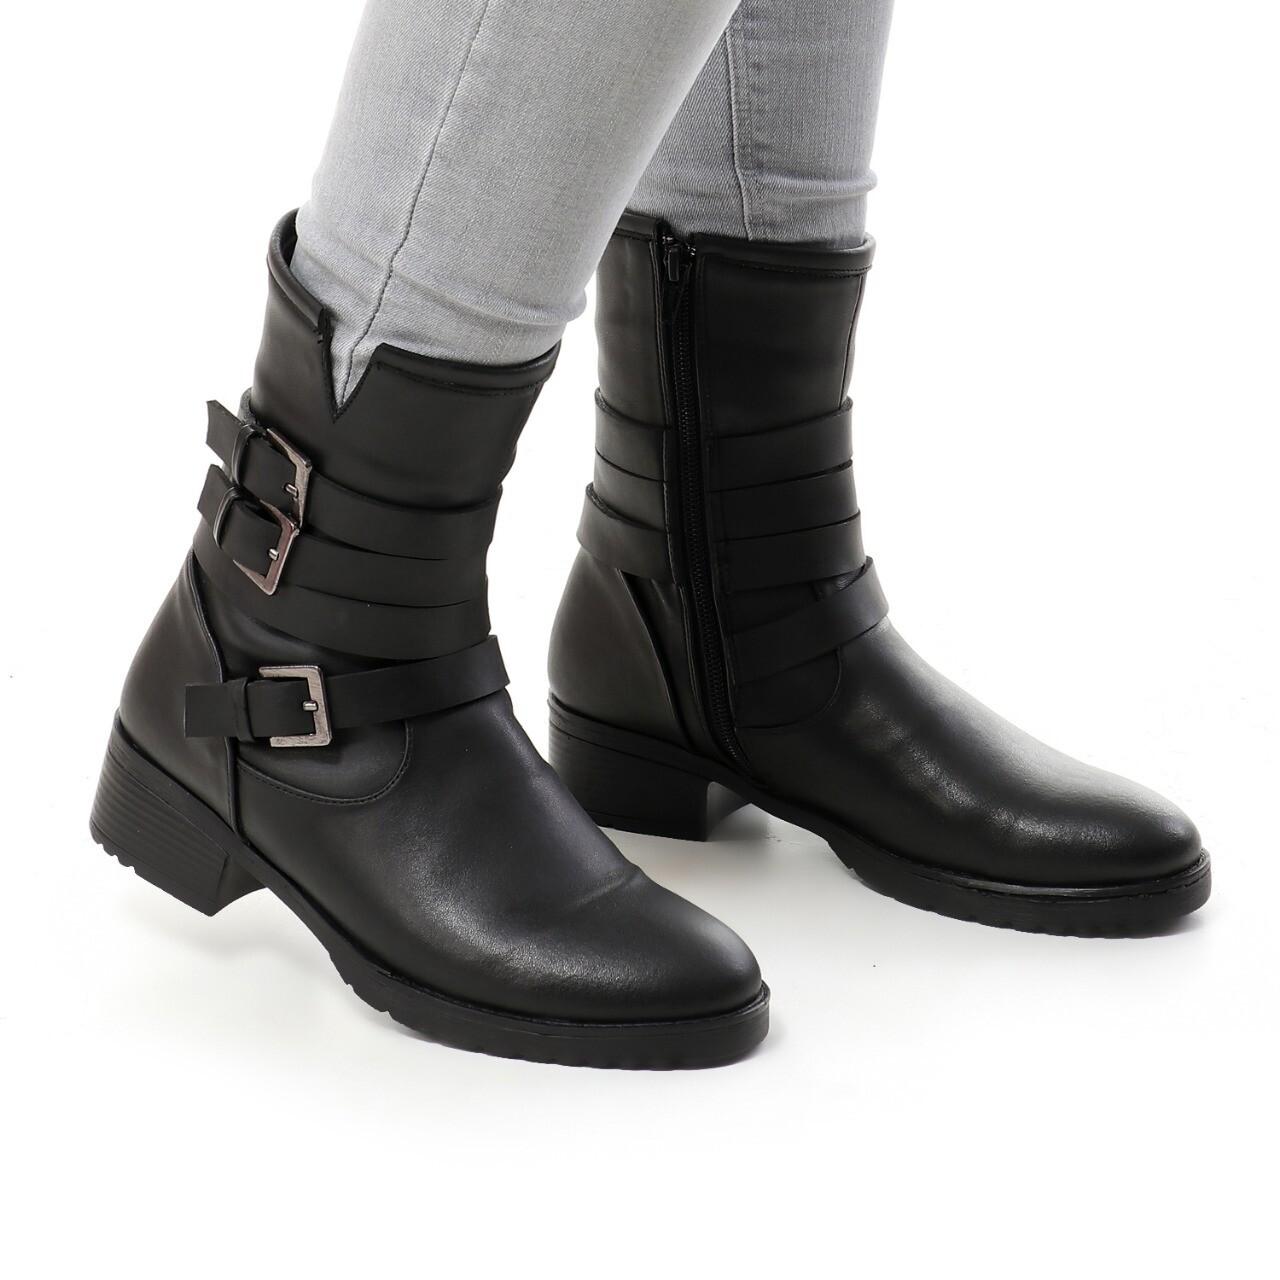 3739 Half Boot - Black